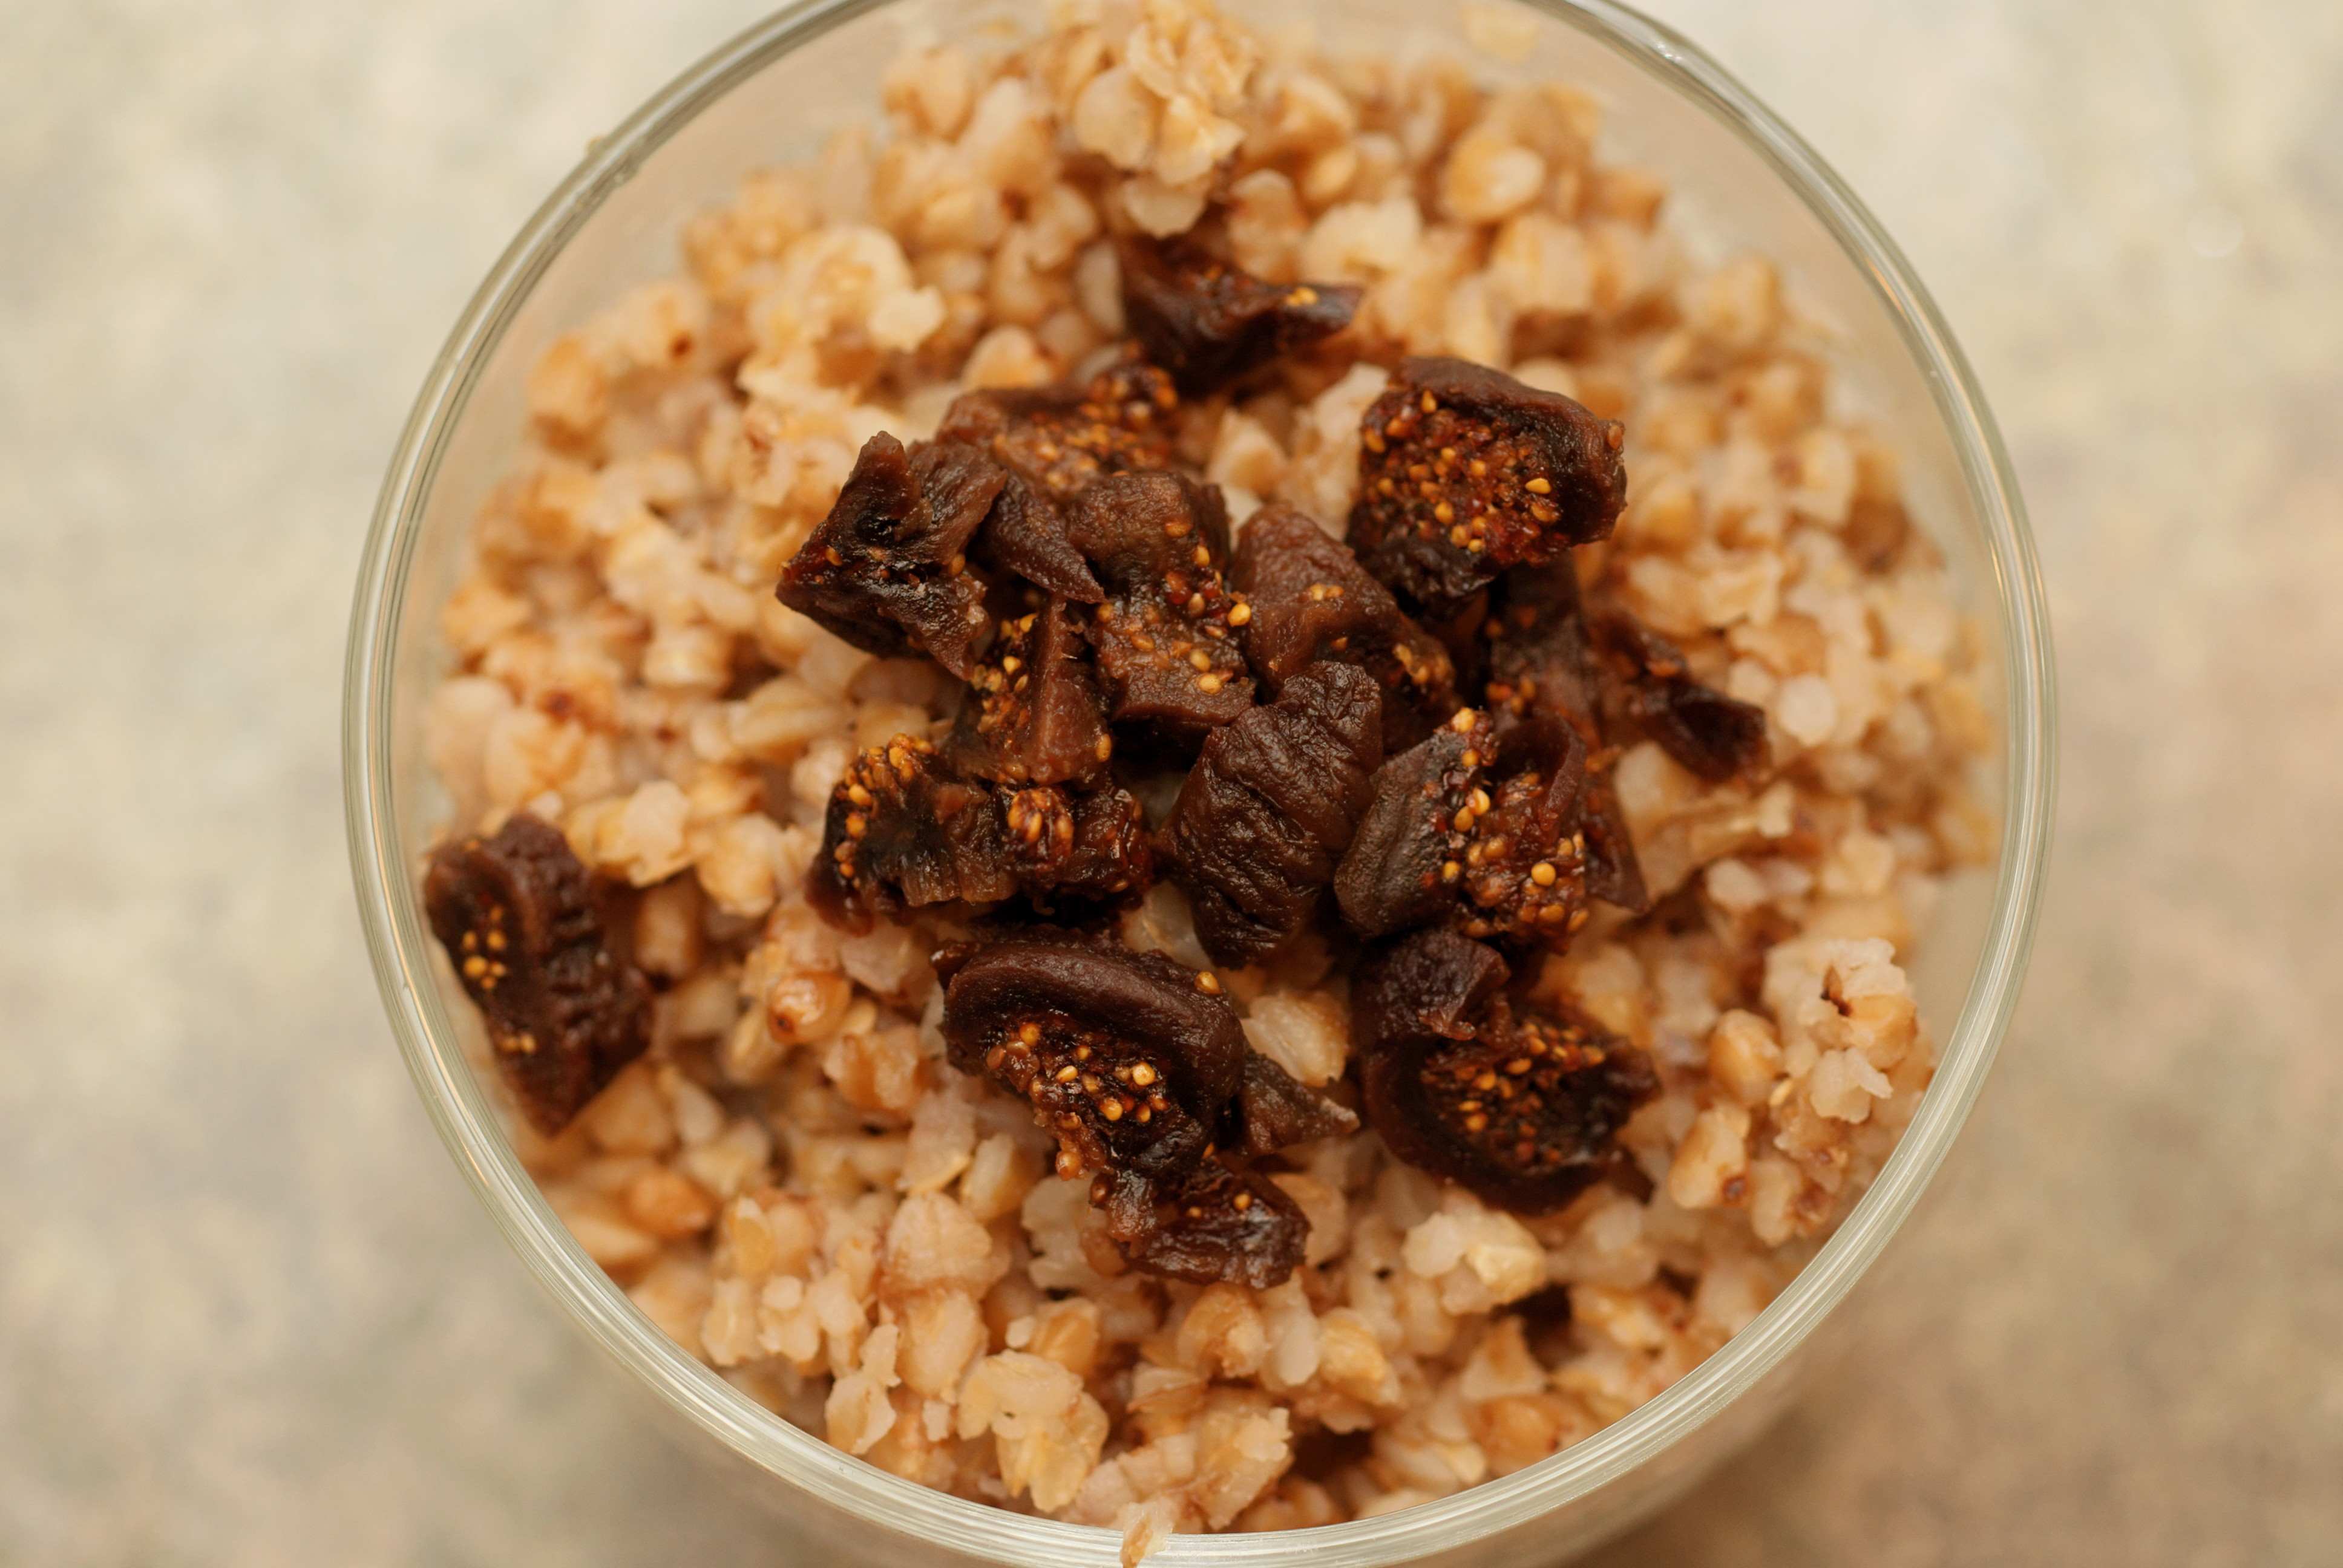 Buckwheat Kasha Recipe with Dried Mushrooms